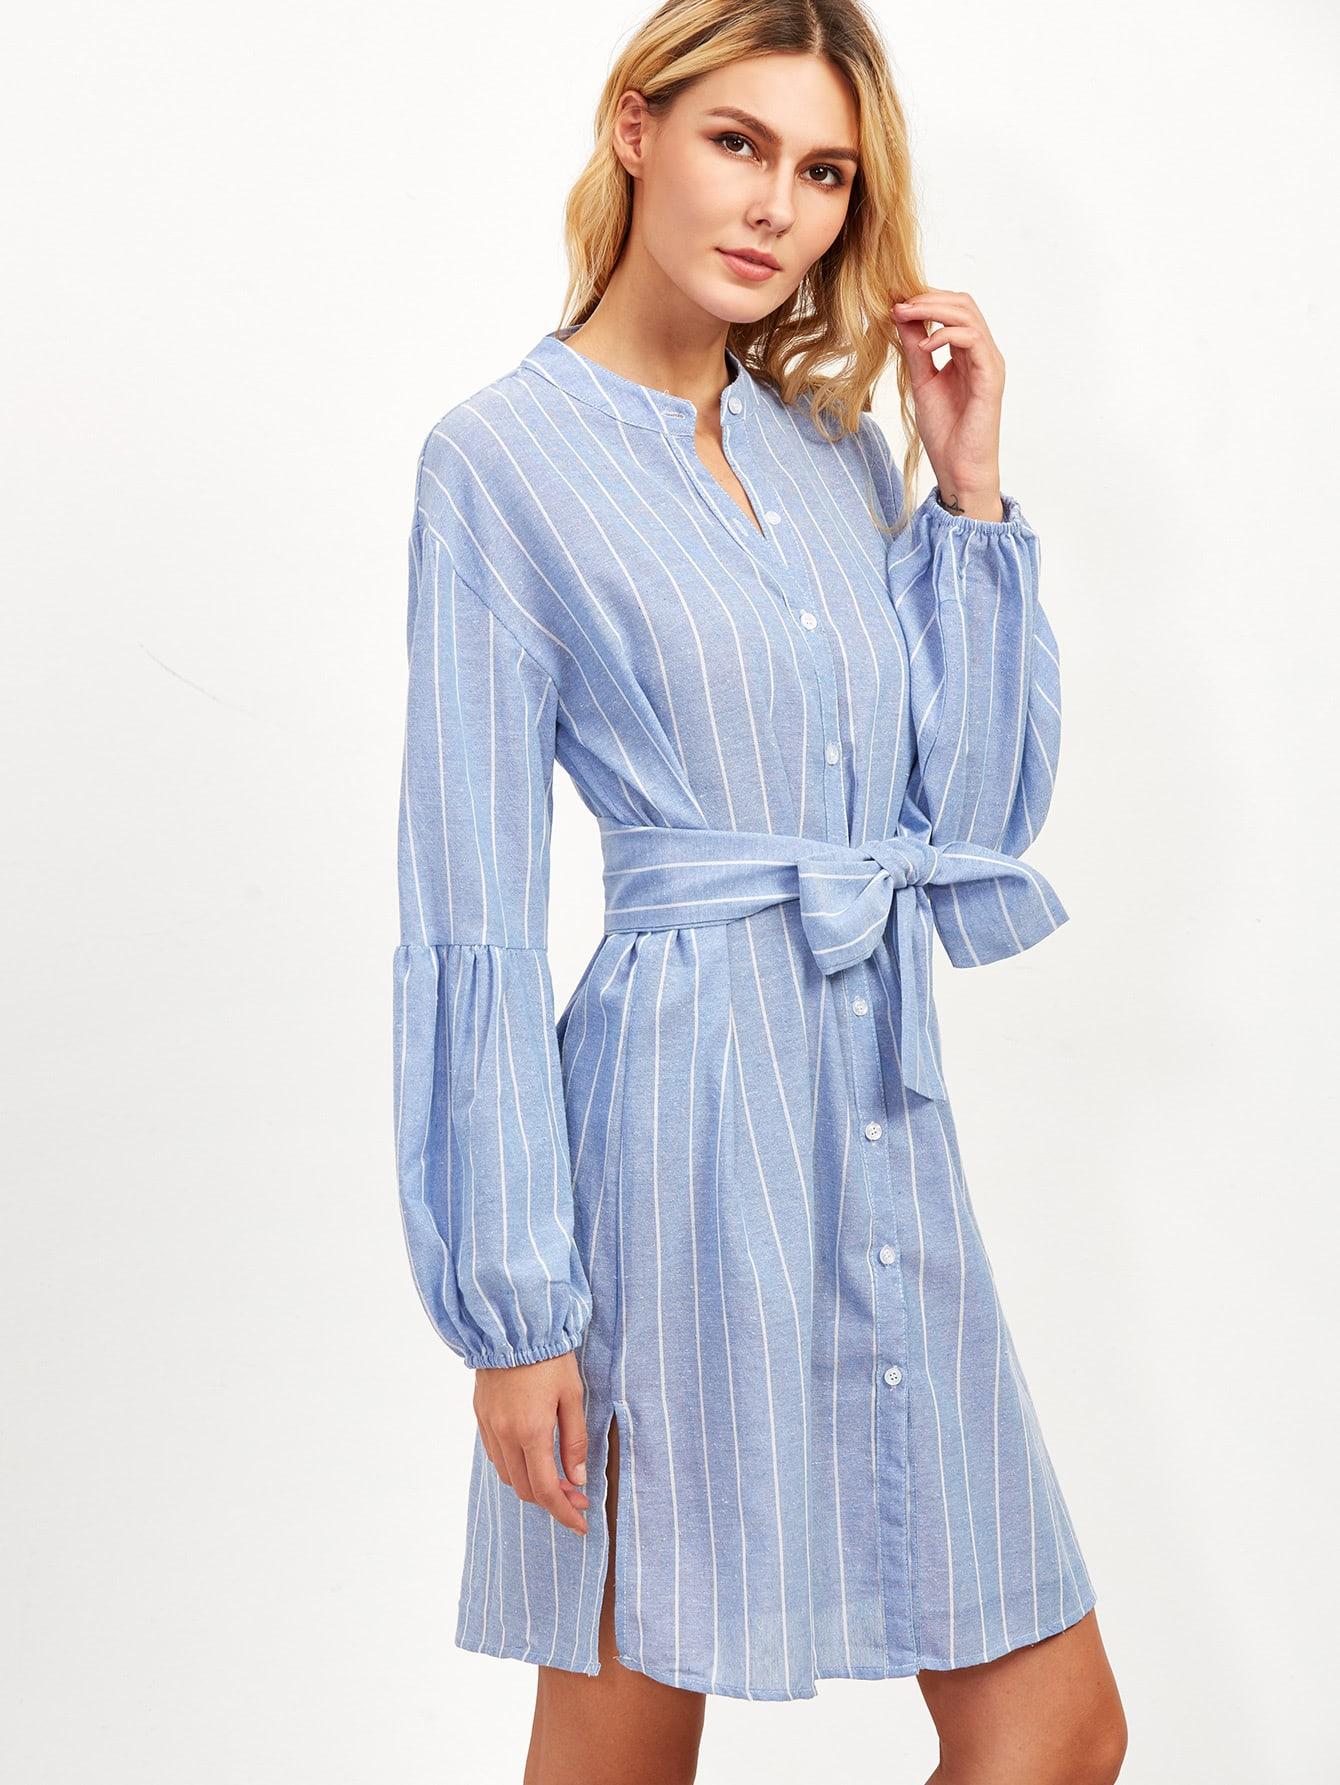 Blue Vertical Striped Lantern Sleeve Belted Shirt DressBlue Vertical Striped Lantern Sleeve Belted Shirt Dress<br><br>color: Blue<br>size: L,M,S